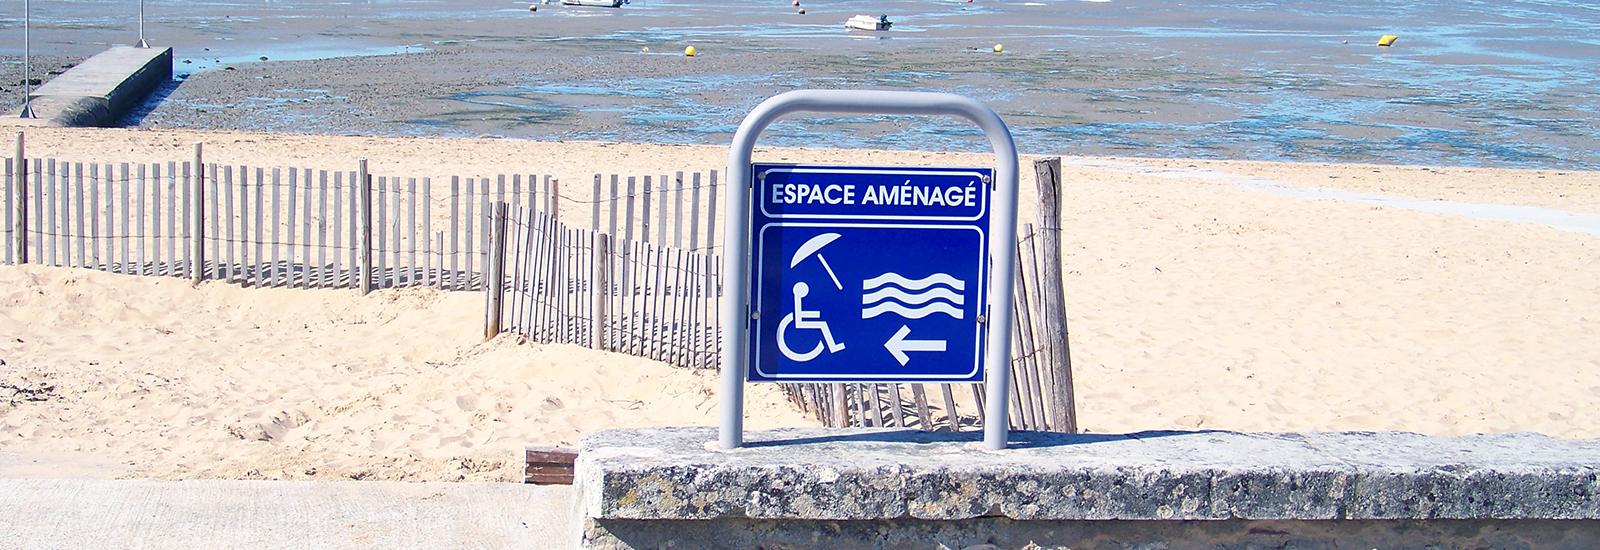 agencement territoire handicap geonauvha bien etre accessibilite